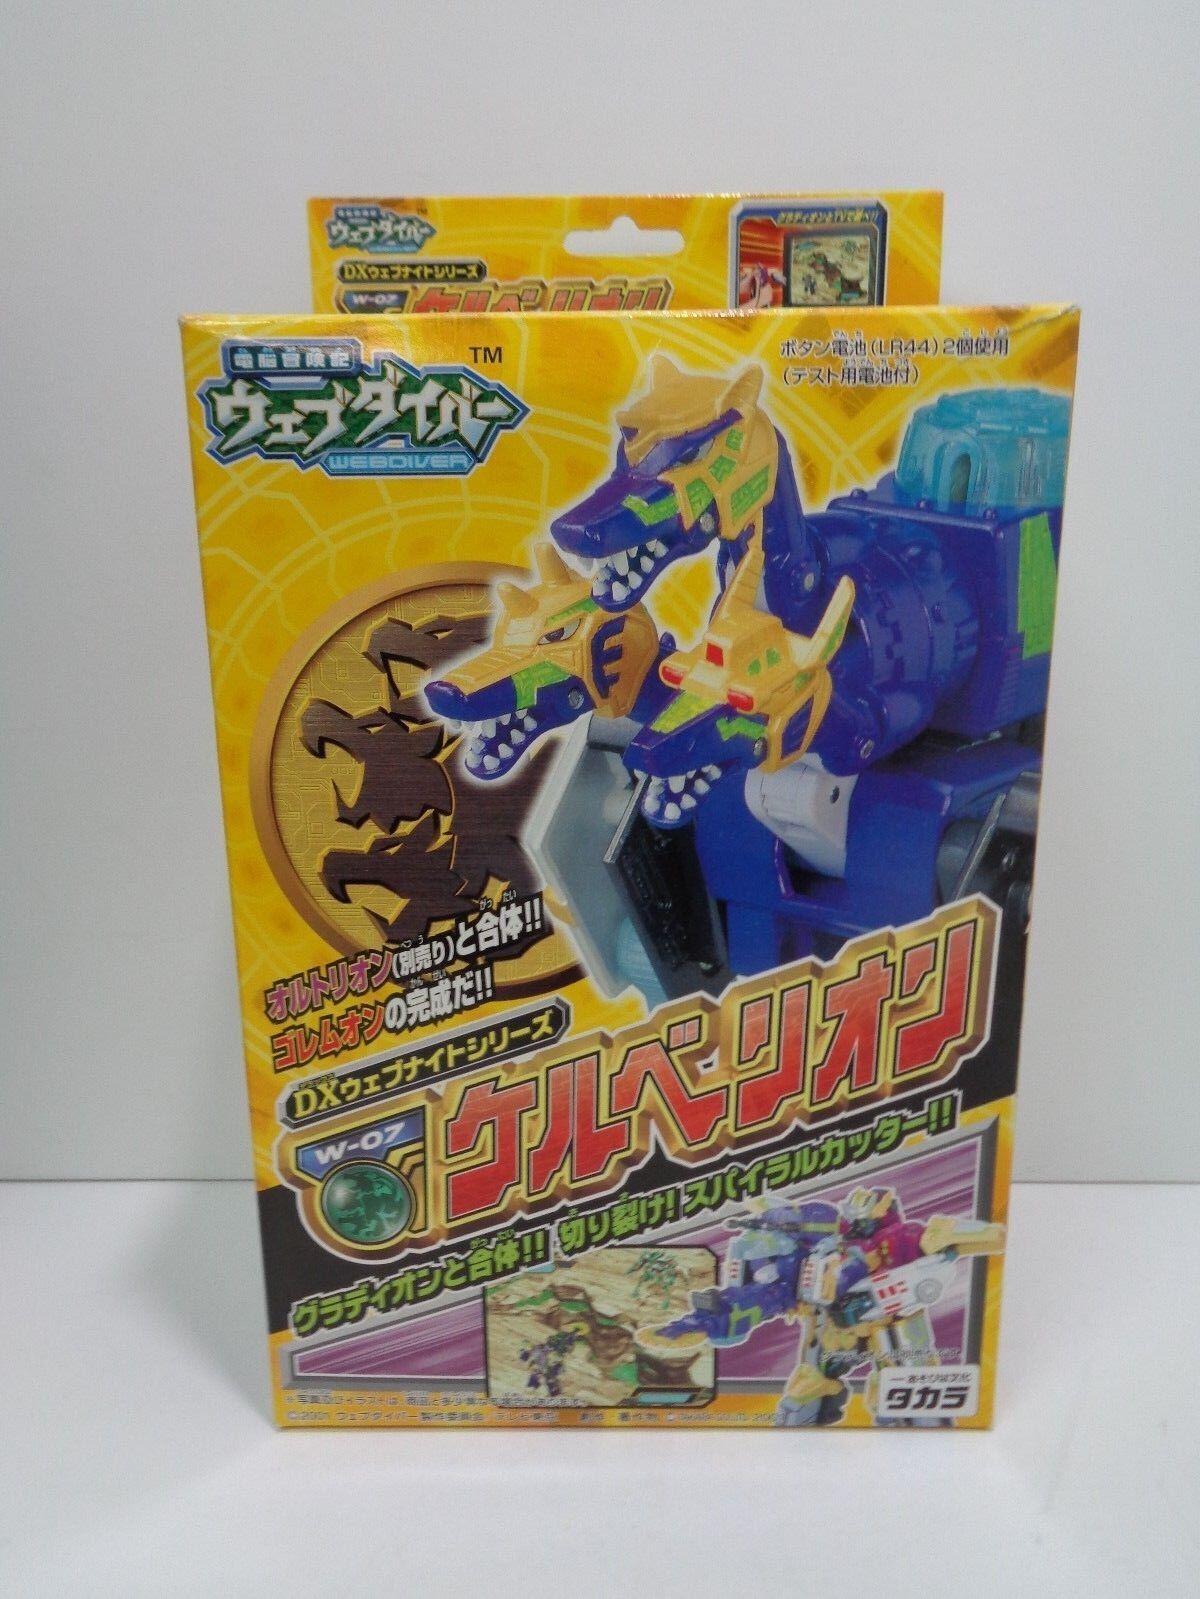 Webdiver KERBERION W-07 - Complete Figure MIB - 2001 Takara Takara Takara (JAPAN IMPORT) a362b9